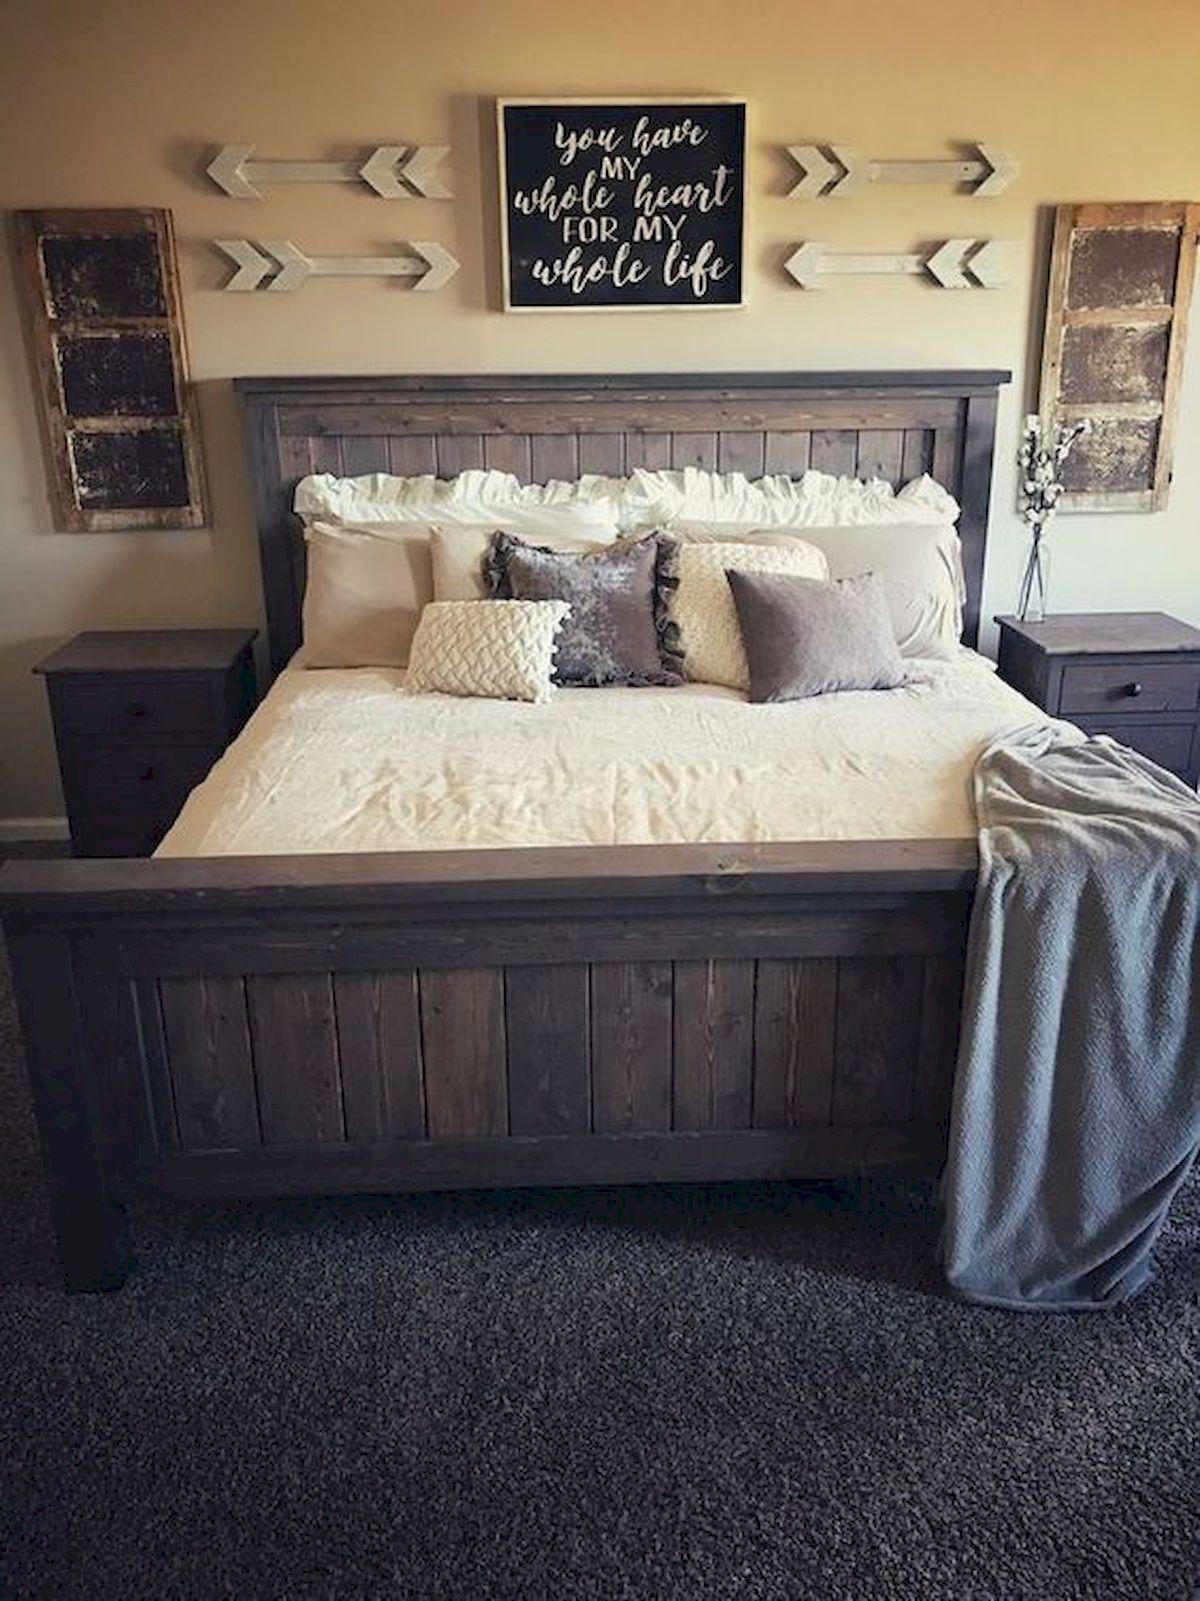 55 Romantic Bedroom Decor Ideas For Couple Rustic Master Bedroom Decor Modern Rustic Master Bedroom Master Bedrooms Decor